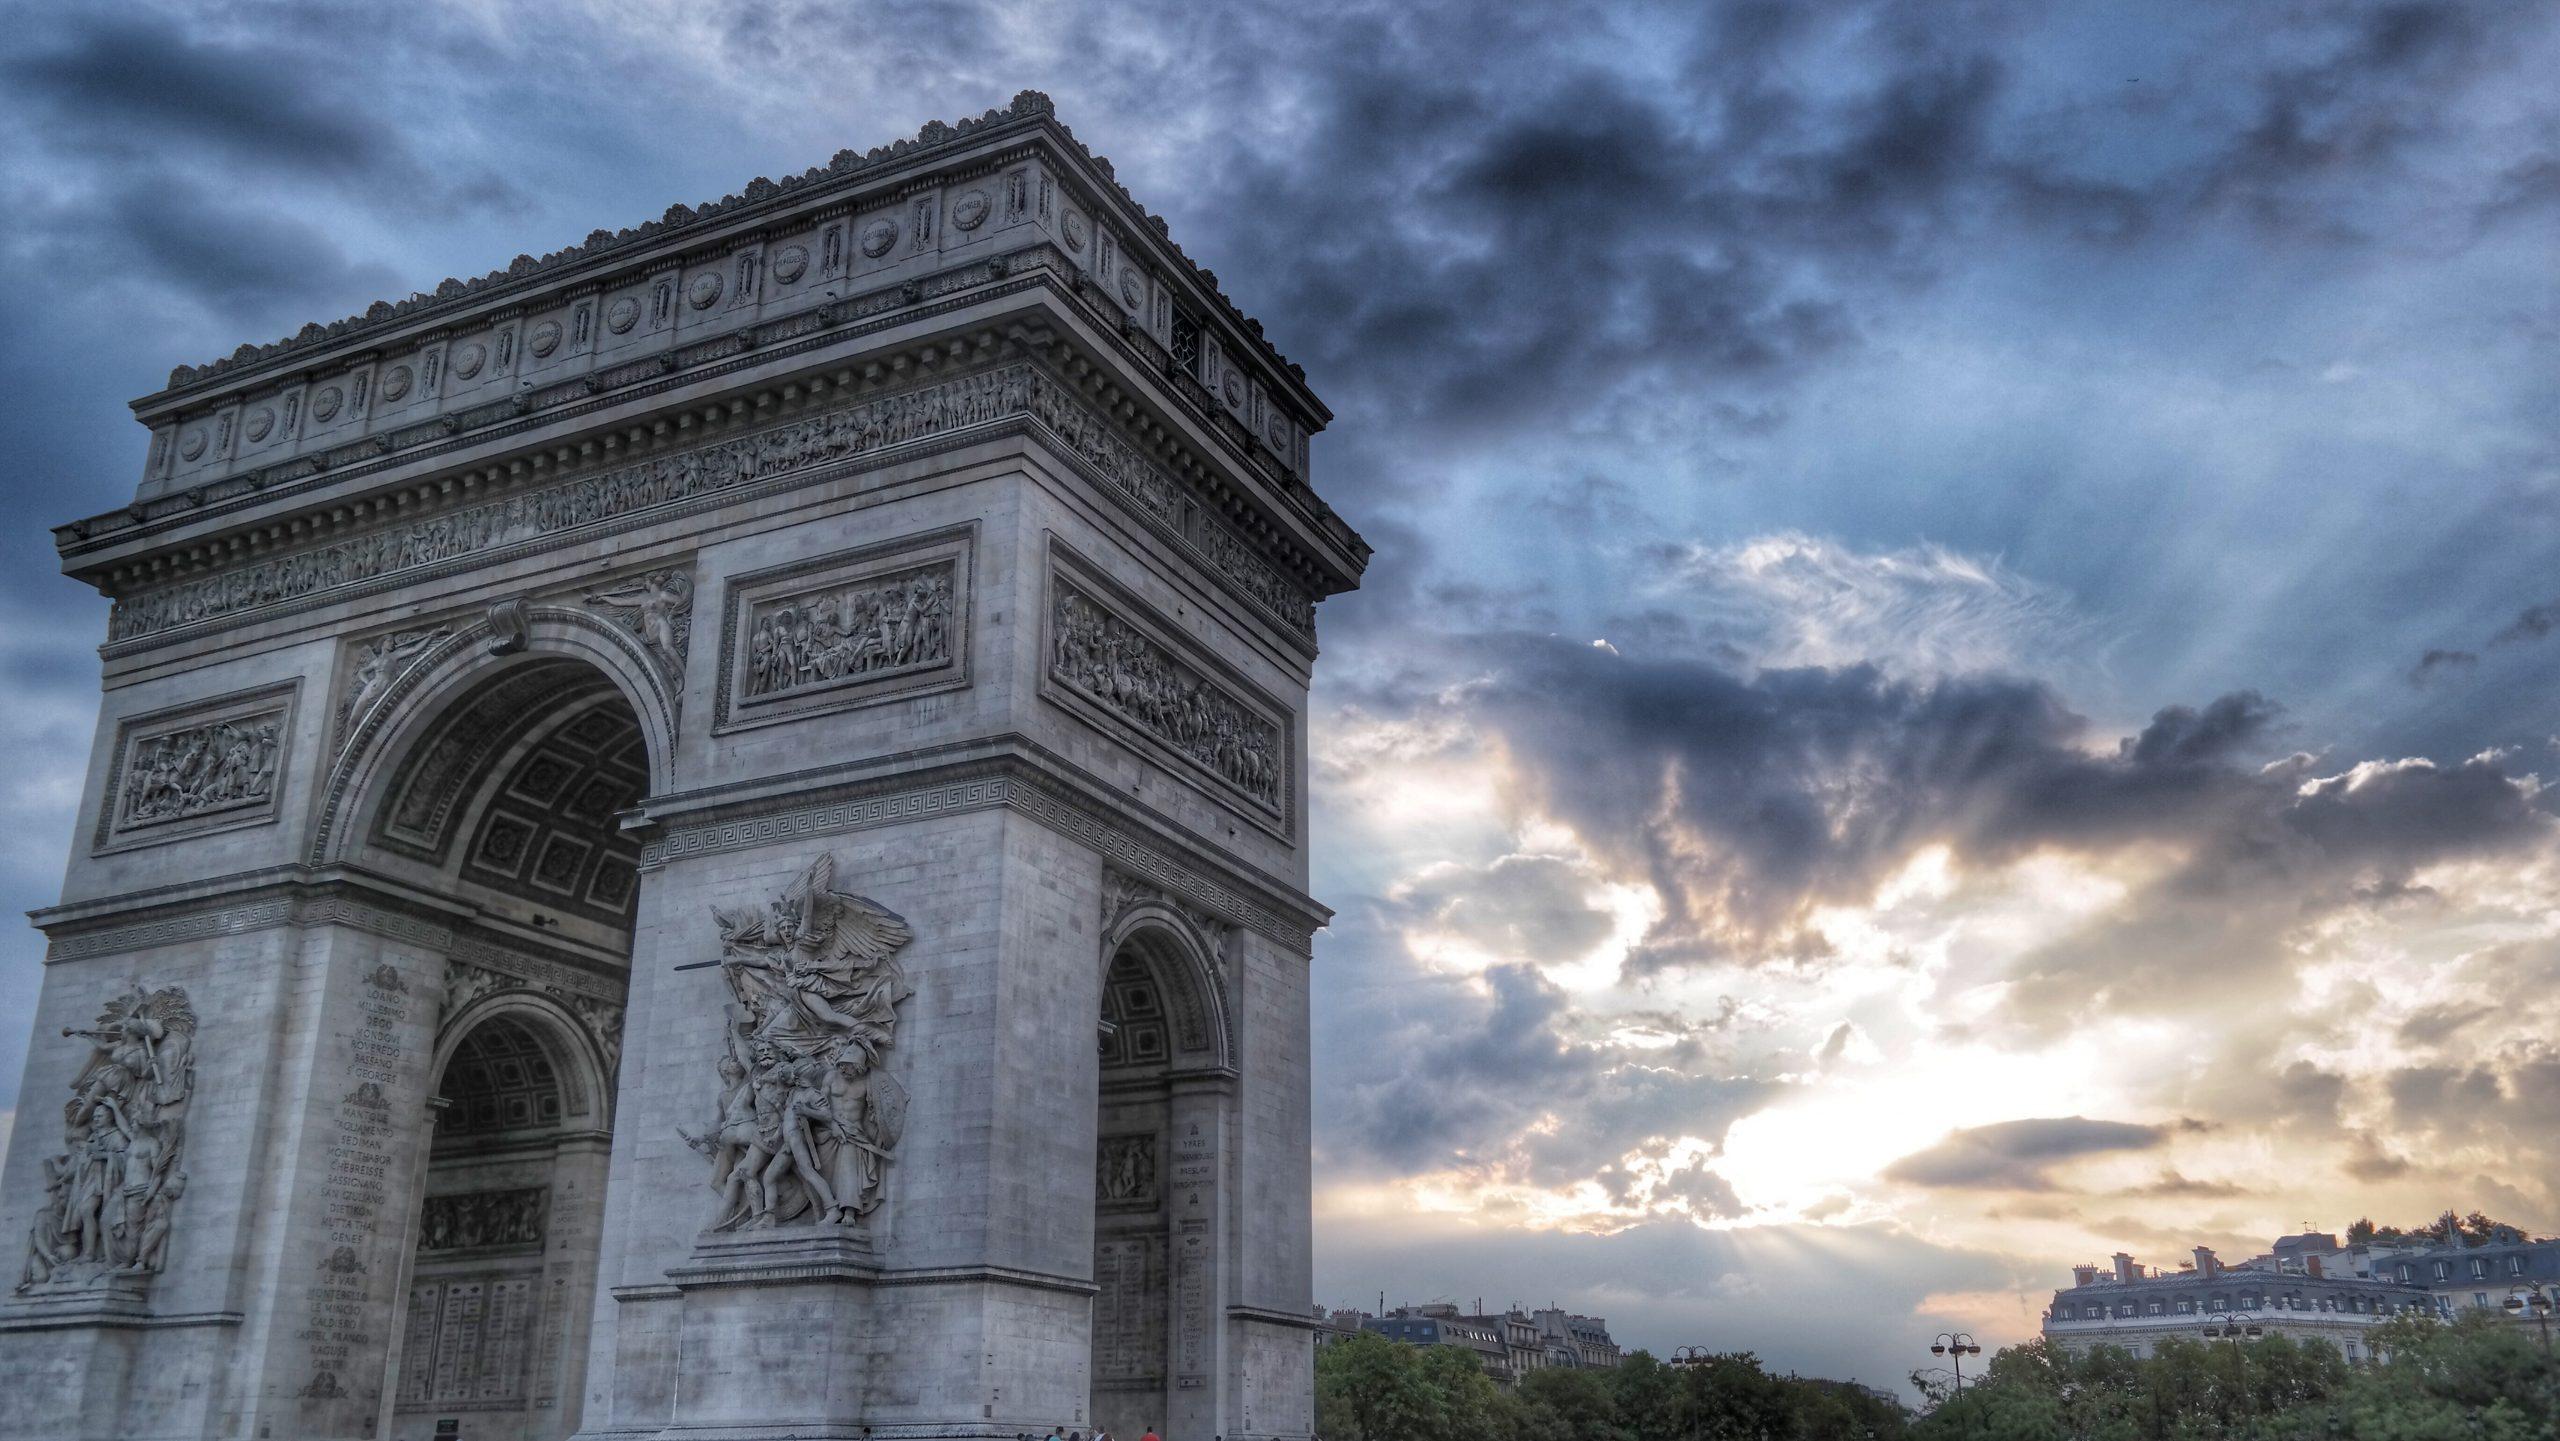 Arc de Triumph symbolizing international studies